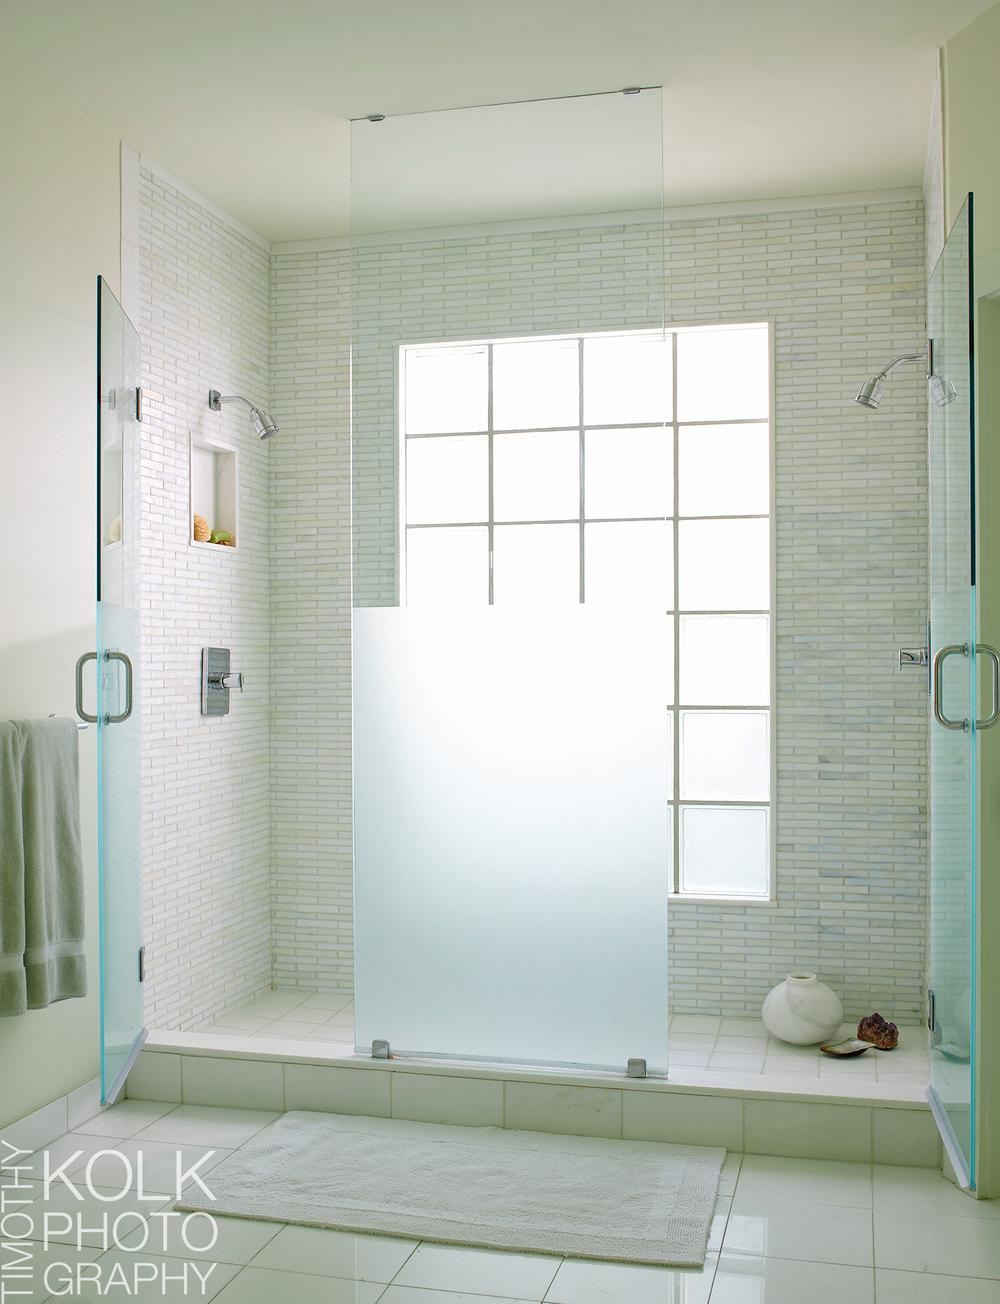 Hardage_shower_ppw.jpg